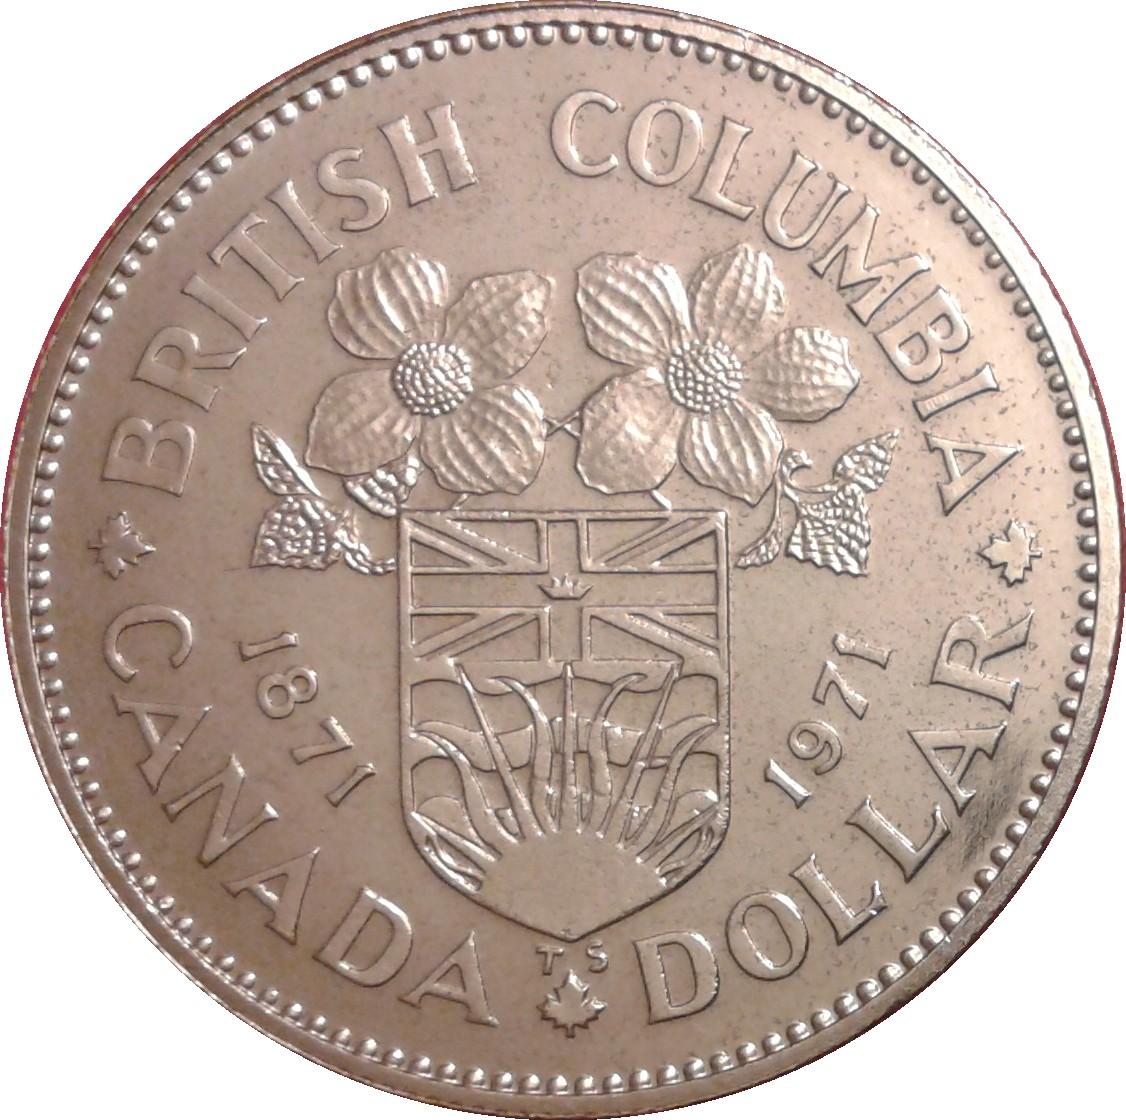 Canada Commemorative Silver Dollar 1971 British Columbia Centennial   #180248